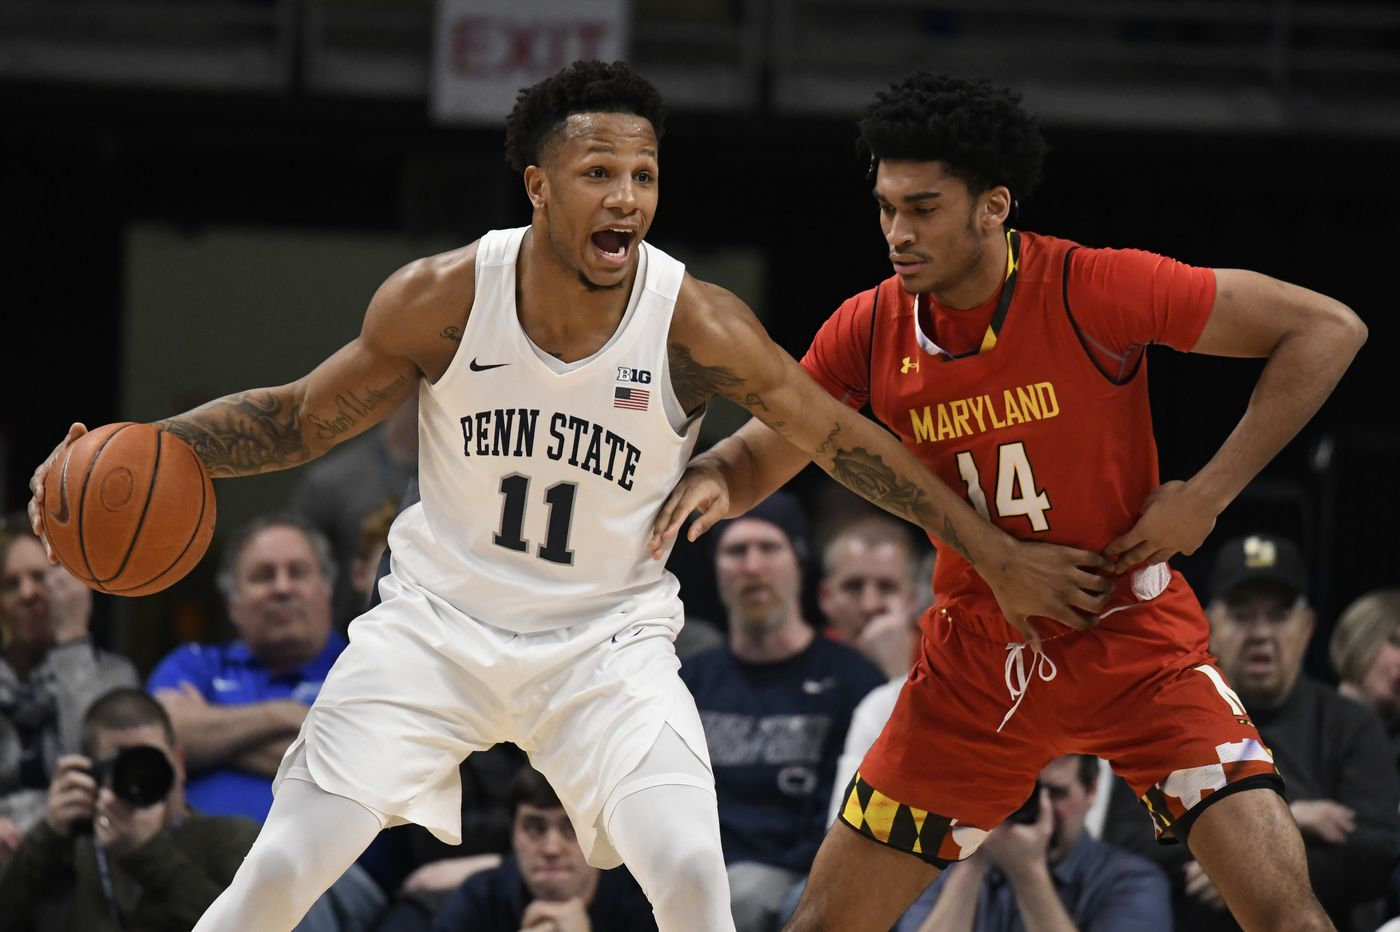 Penn State freshman Seth Lundy is learning from fellow Roman Catholic grad Lamar Stevens